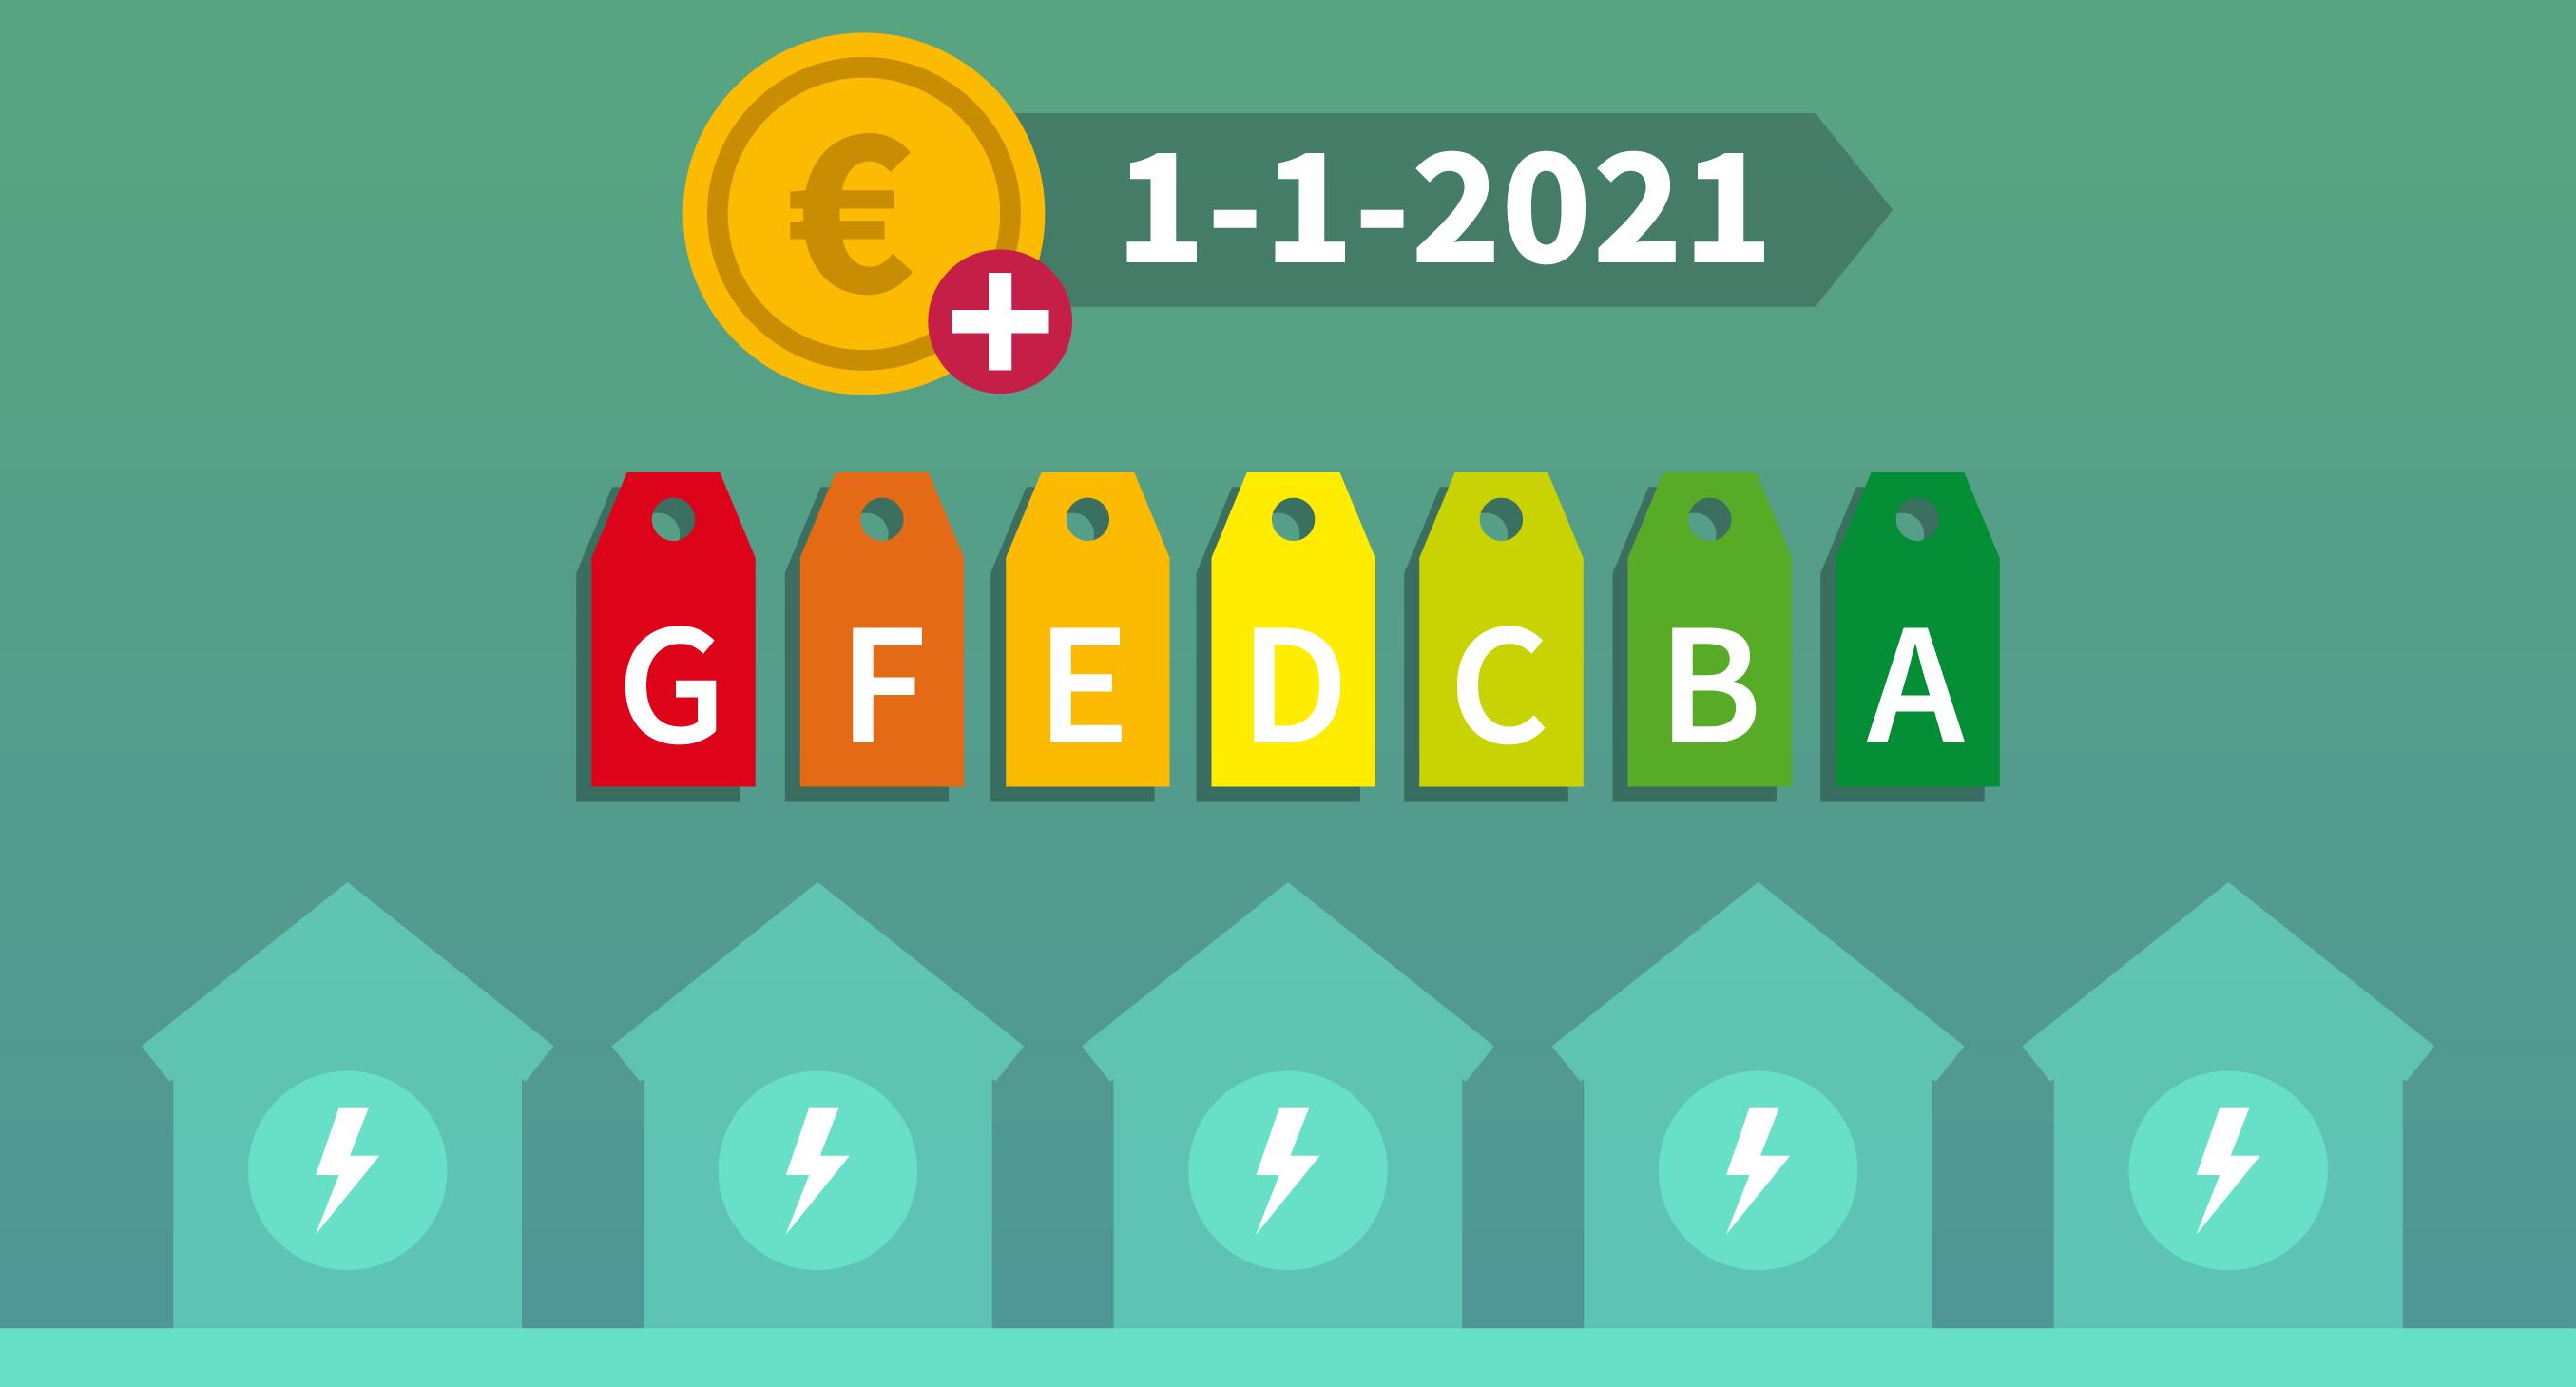 Het nieuwe energielabel vanaf 1 januari 2021